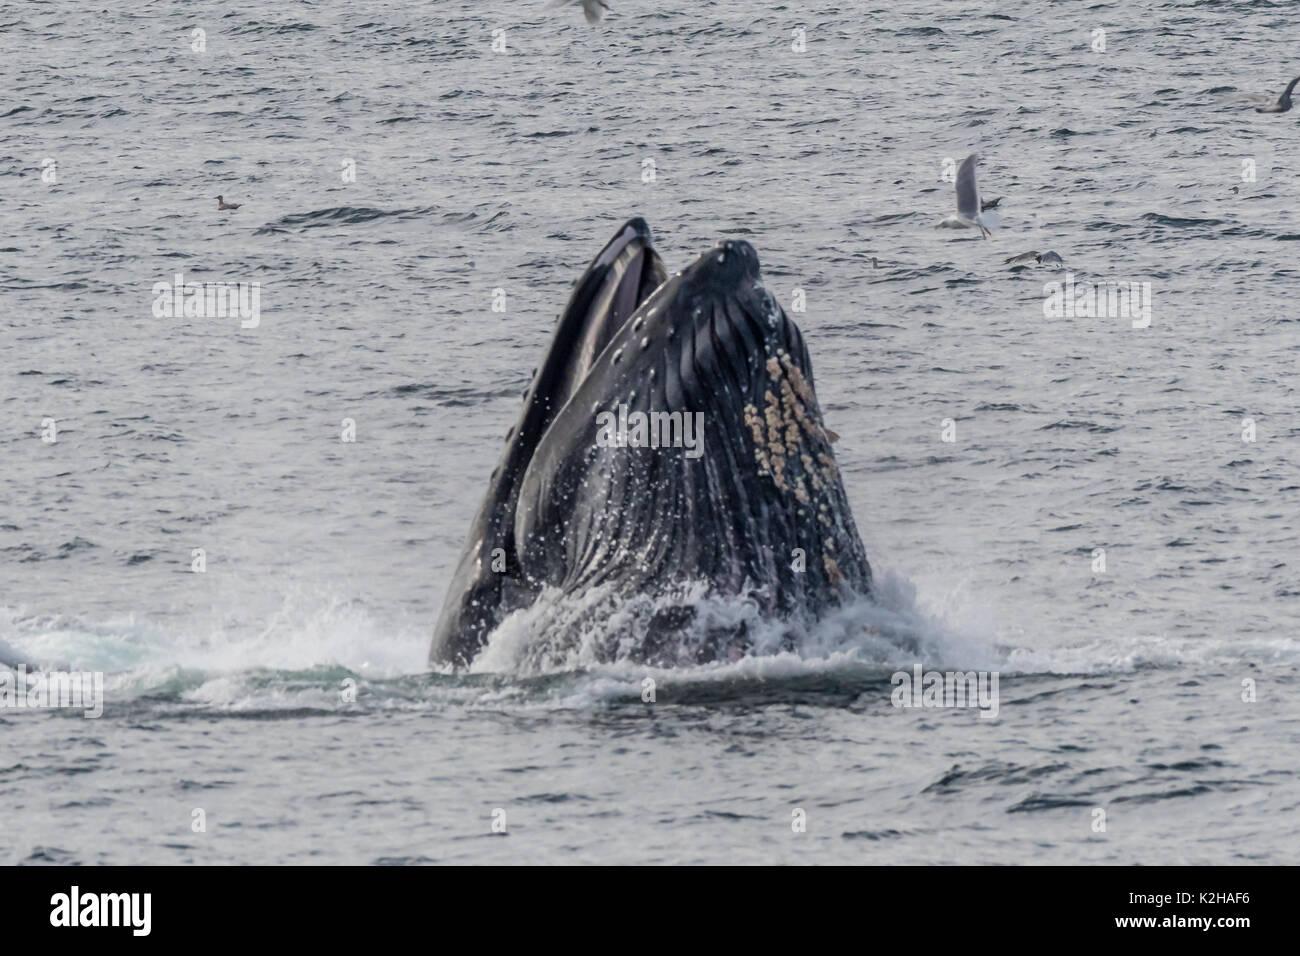 Grupo de ballenas jorobadas (Megaptera novaeangliae) para alimentar la red de burbujas en el sureste de Alaska's Inside Passage. Foto de stock